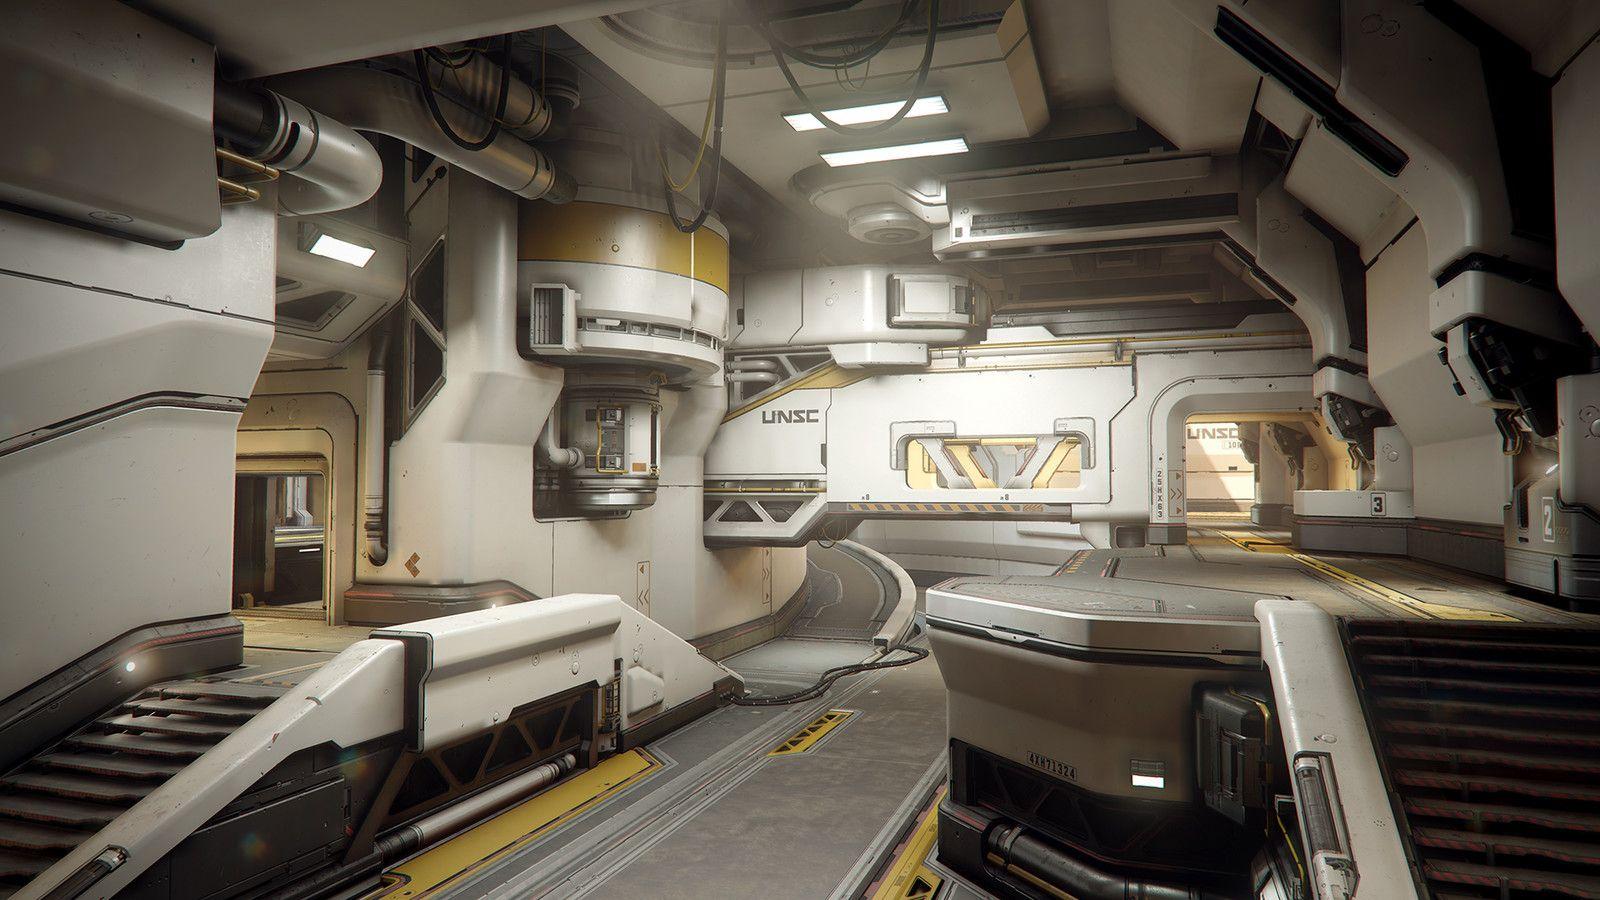 pingl par bruno morin sur 3d environments futuristic art spaceship interior et environment. Black Bedroom Furniture Sets. Home Design Ideas